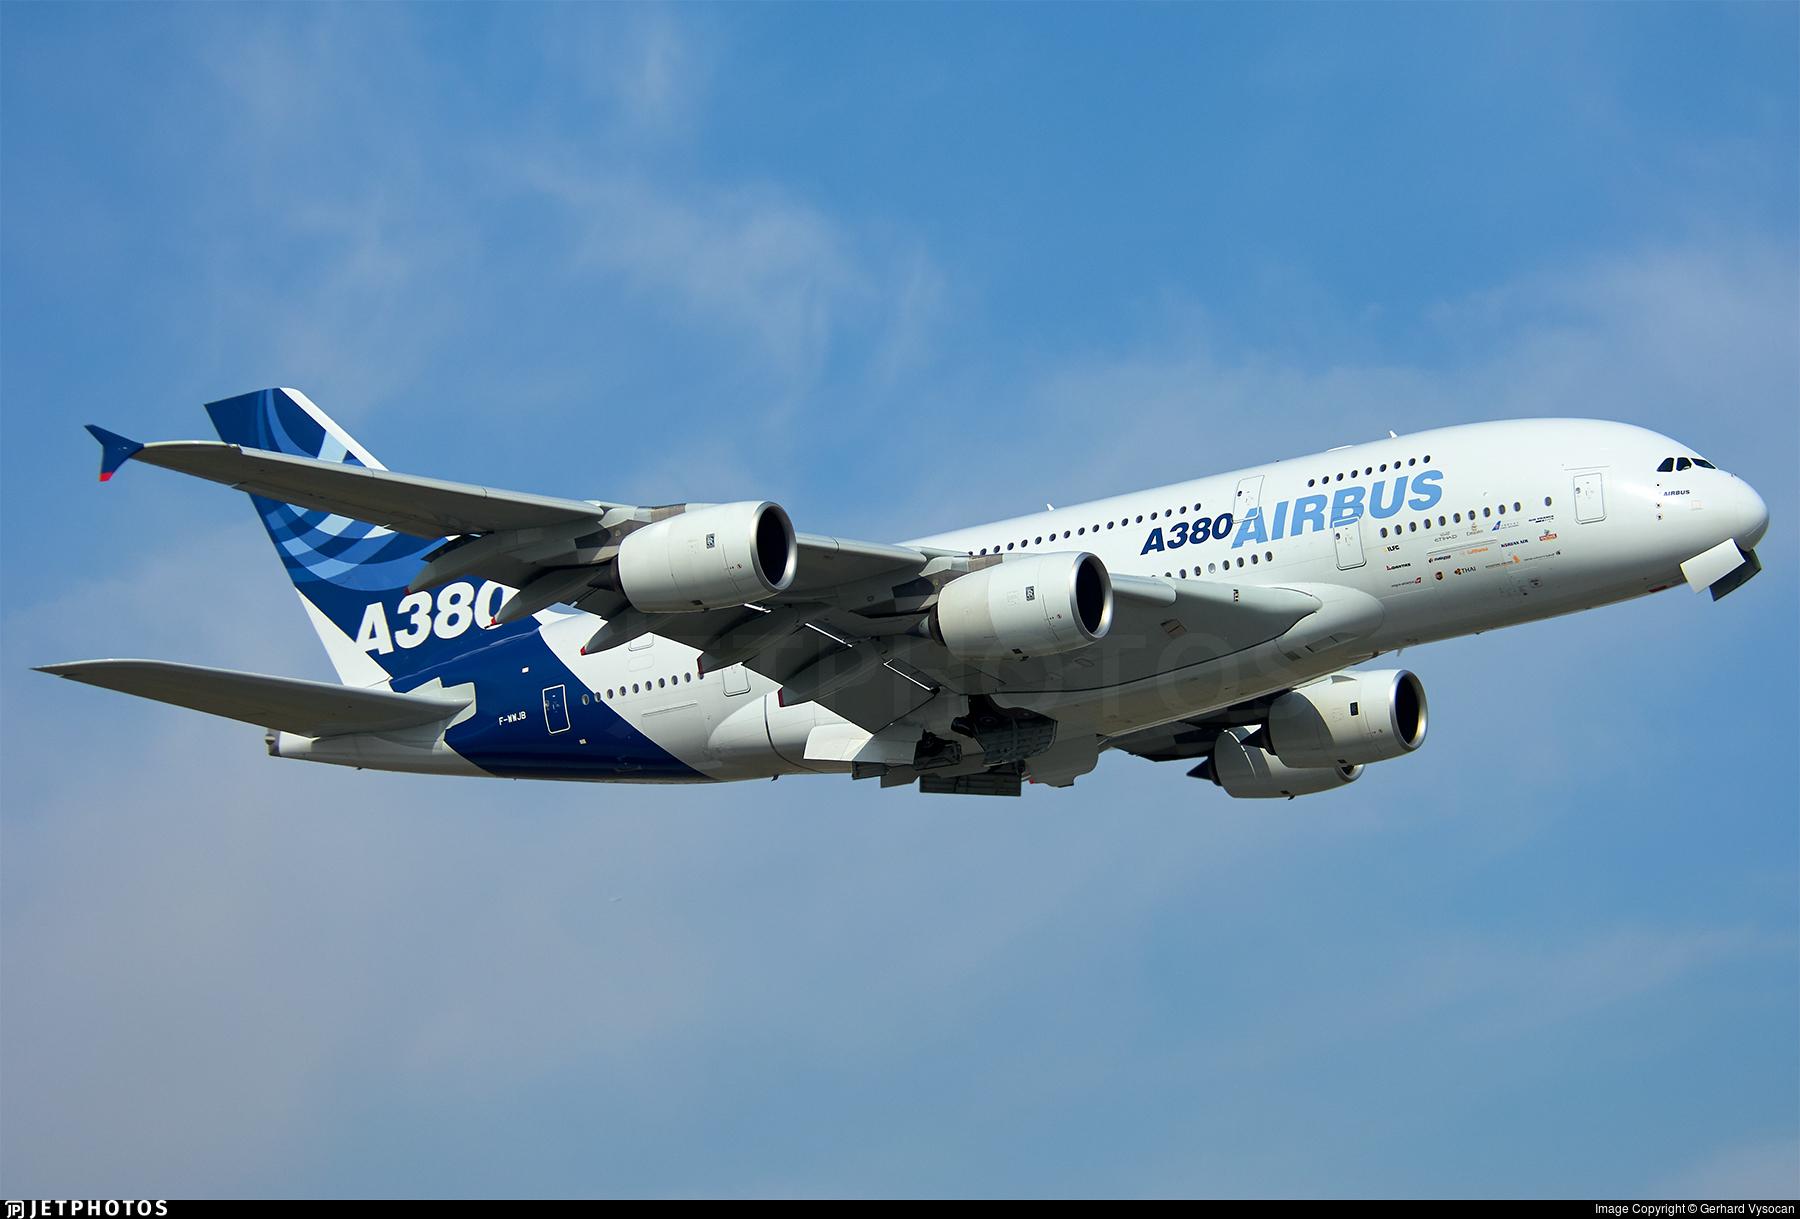 F-WWJB - Airbus A380-841 - Airbus Industrie